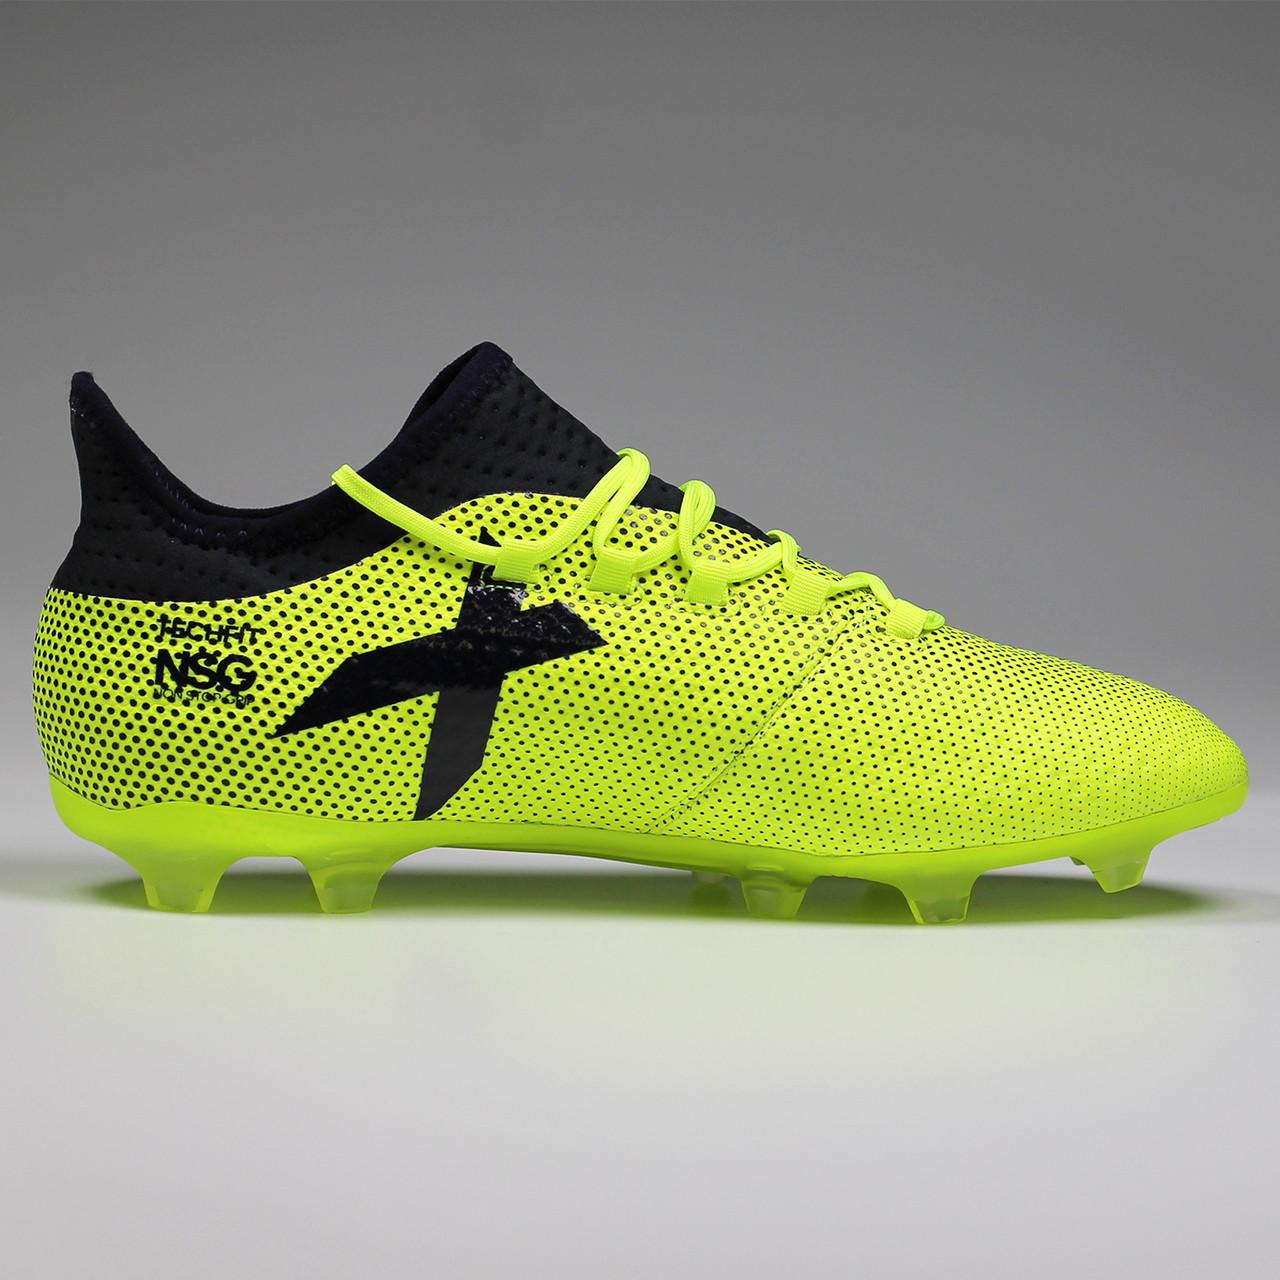 9316fcd24ed Adidas X 17.2 FG Men s Soccer Cleats S82325 - Yellow